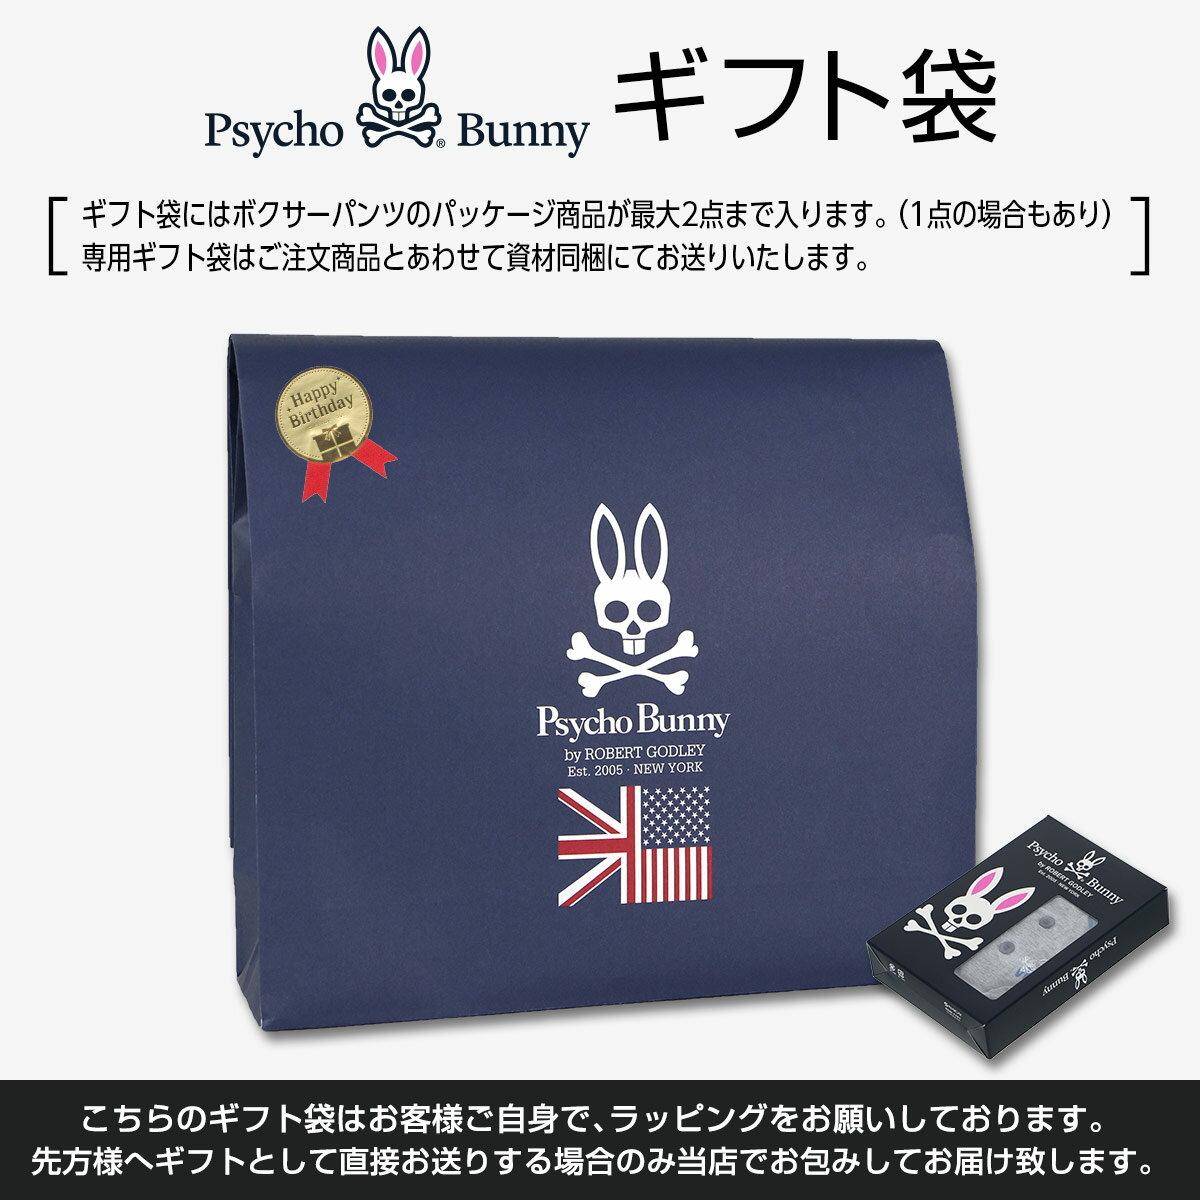 Psycho Bunny(サイコバニー)の可愛い迷彩ボクサーパンツ!